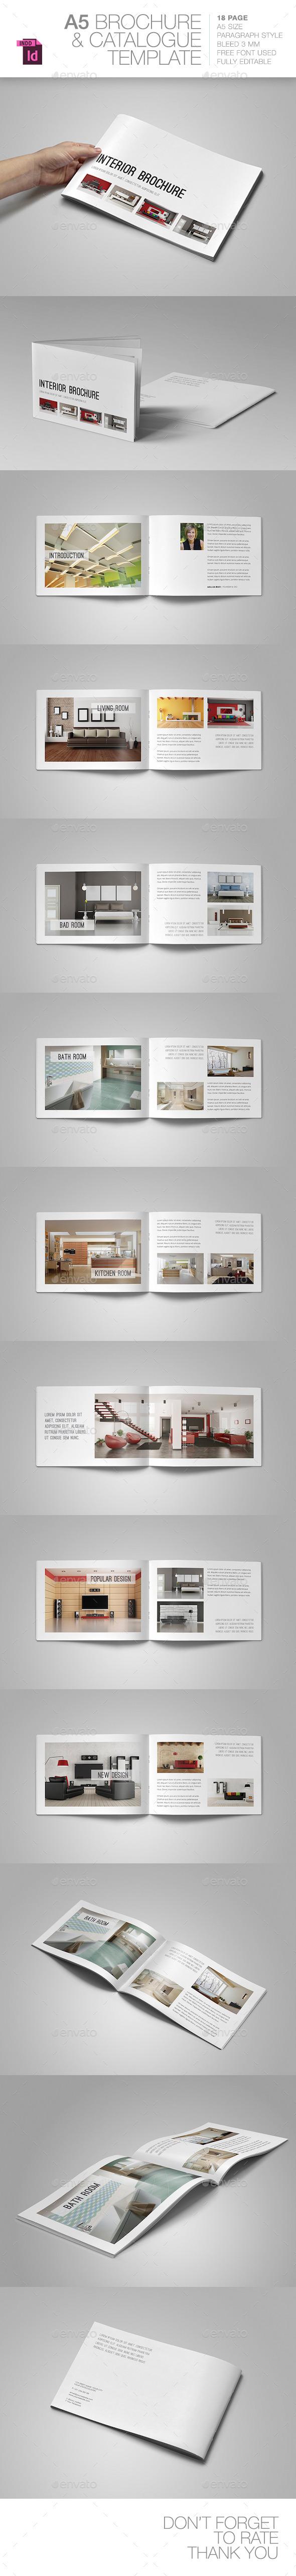 A5 Brochure Template - Brochures Print Templates